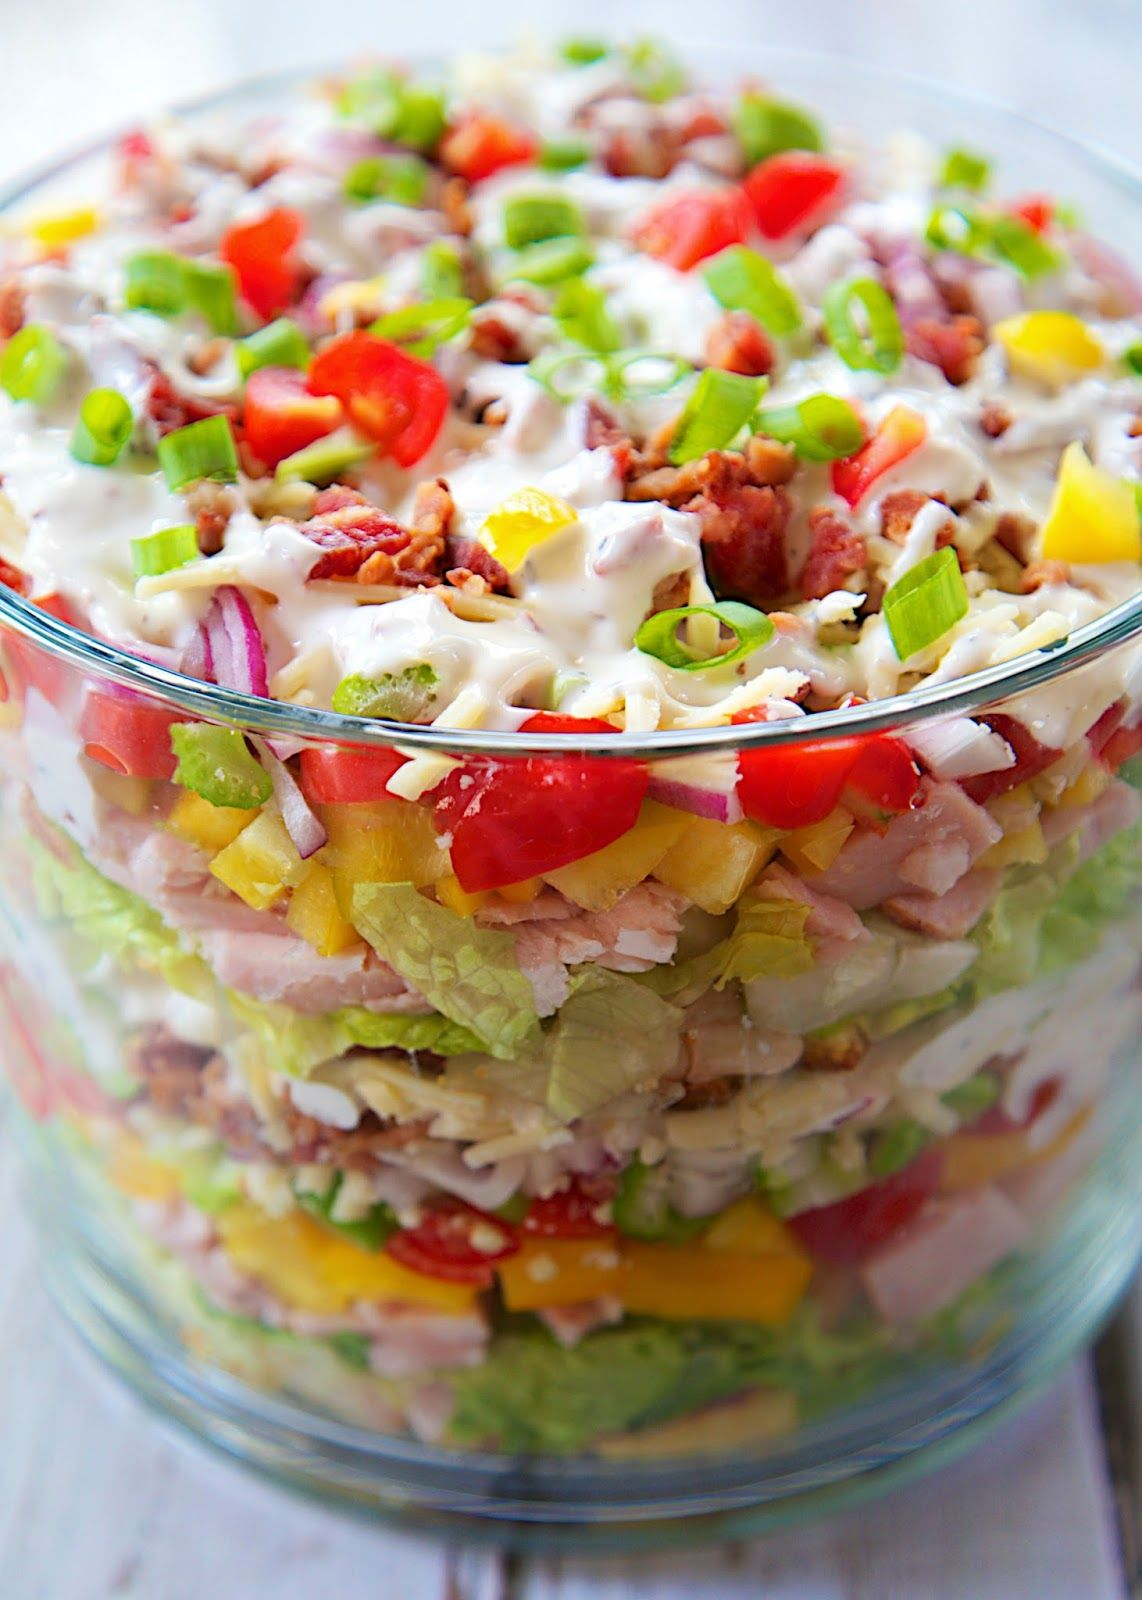 Cornbread & Turkey Layered Salad Recipe loaded with